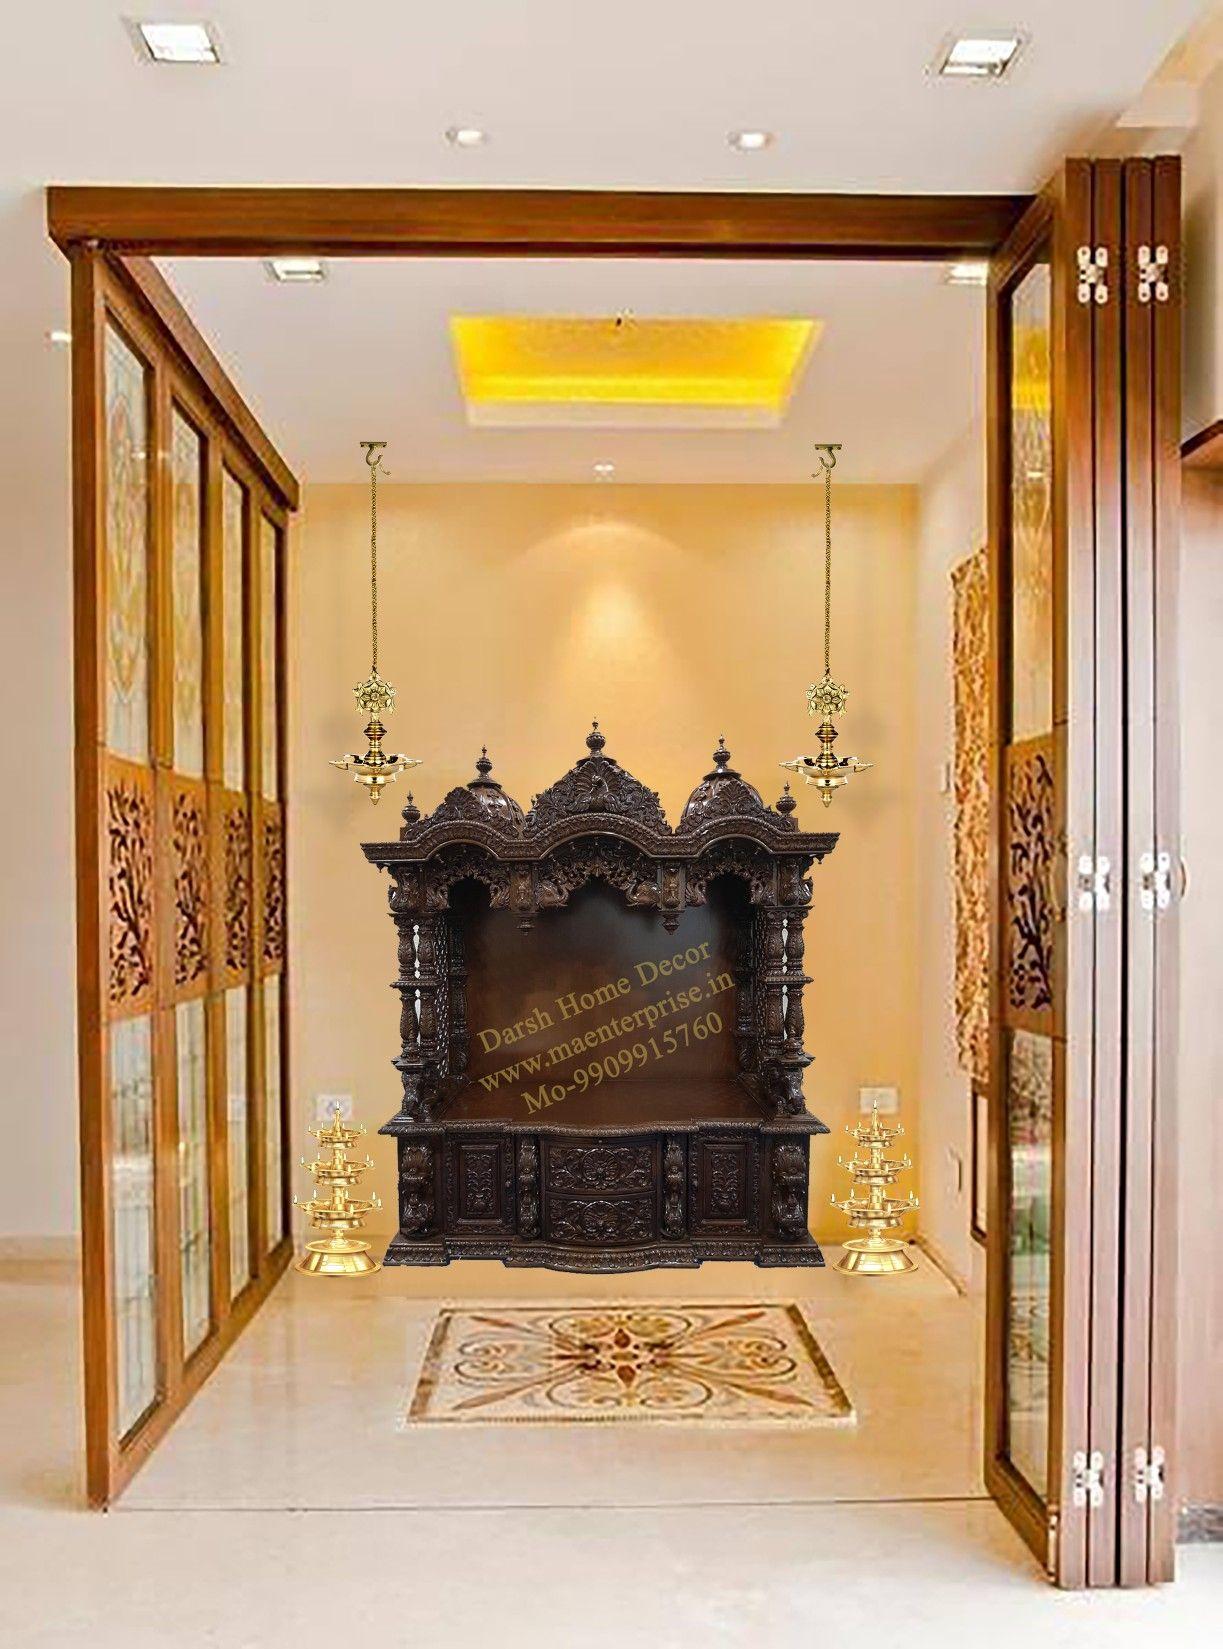 Pooja Mandir For Home Temple In India Usa Australia Ma Enterprise Pooja Room Door Design Pooja Rooms Living Room Design Decor